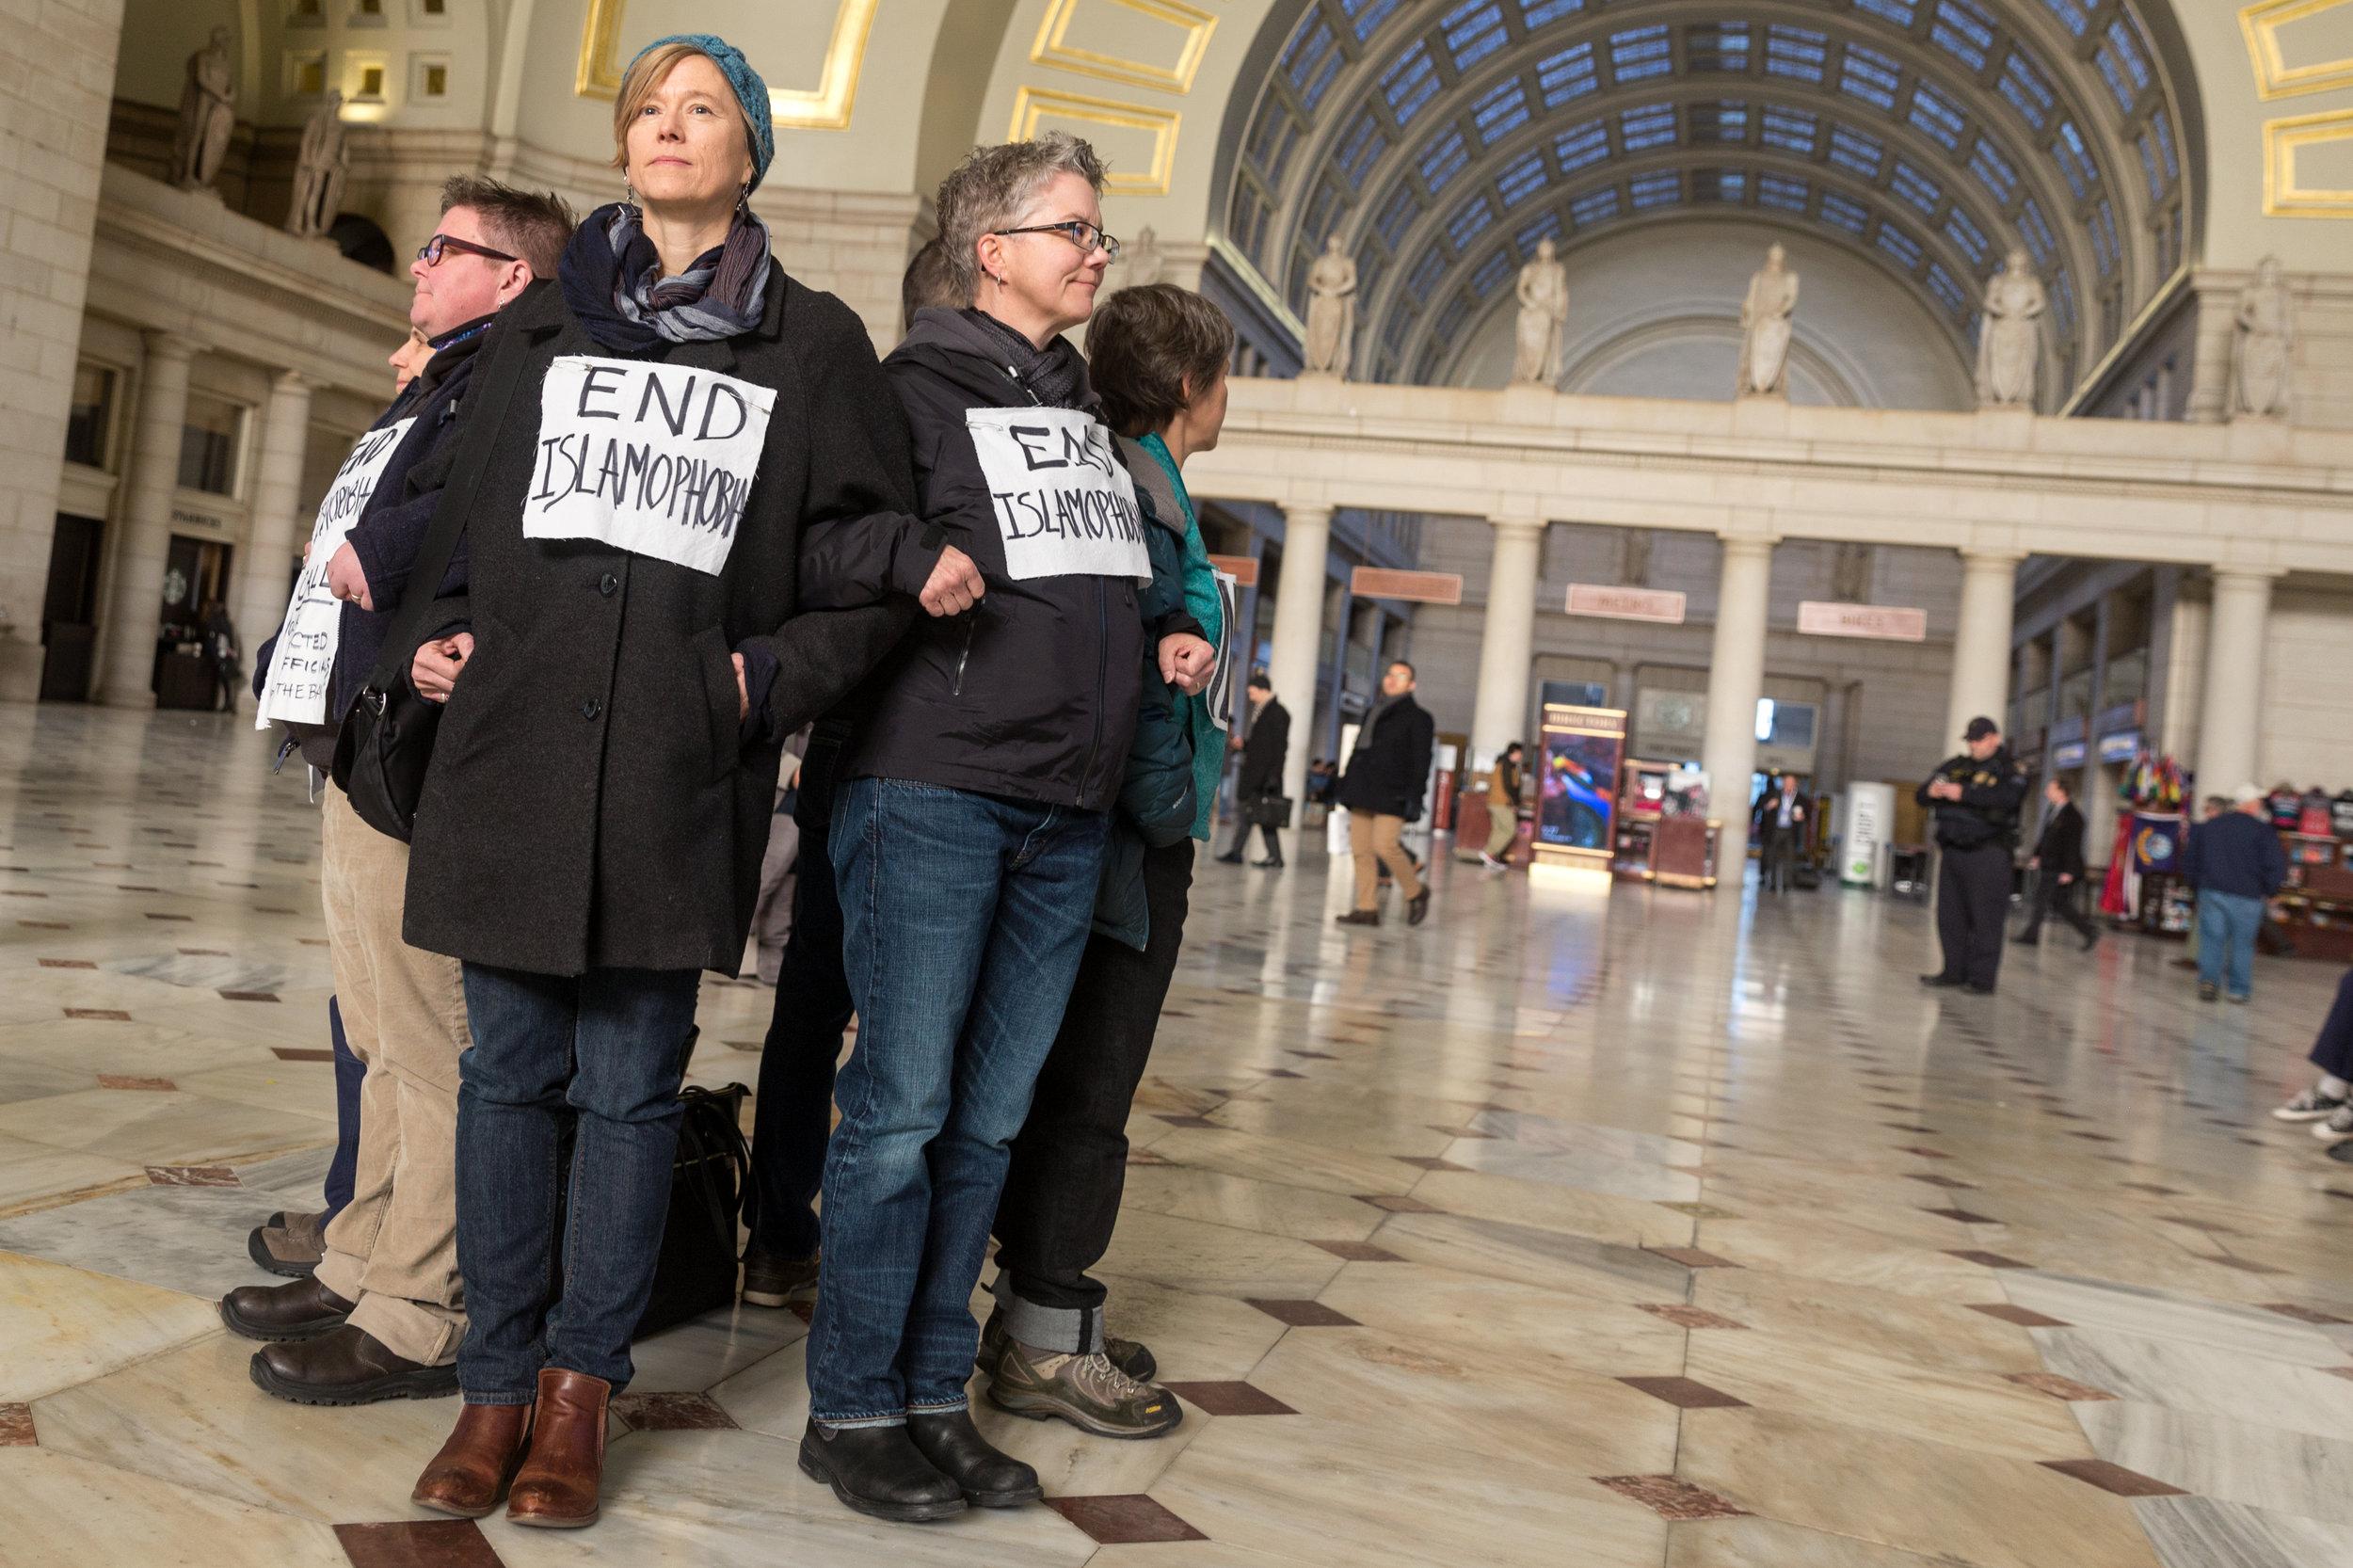 End Islamophobia, Silent Protest at Union Station, Washington DC